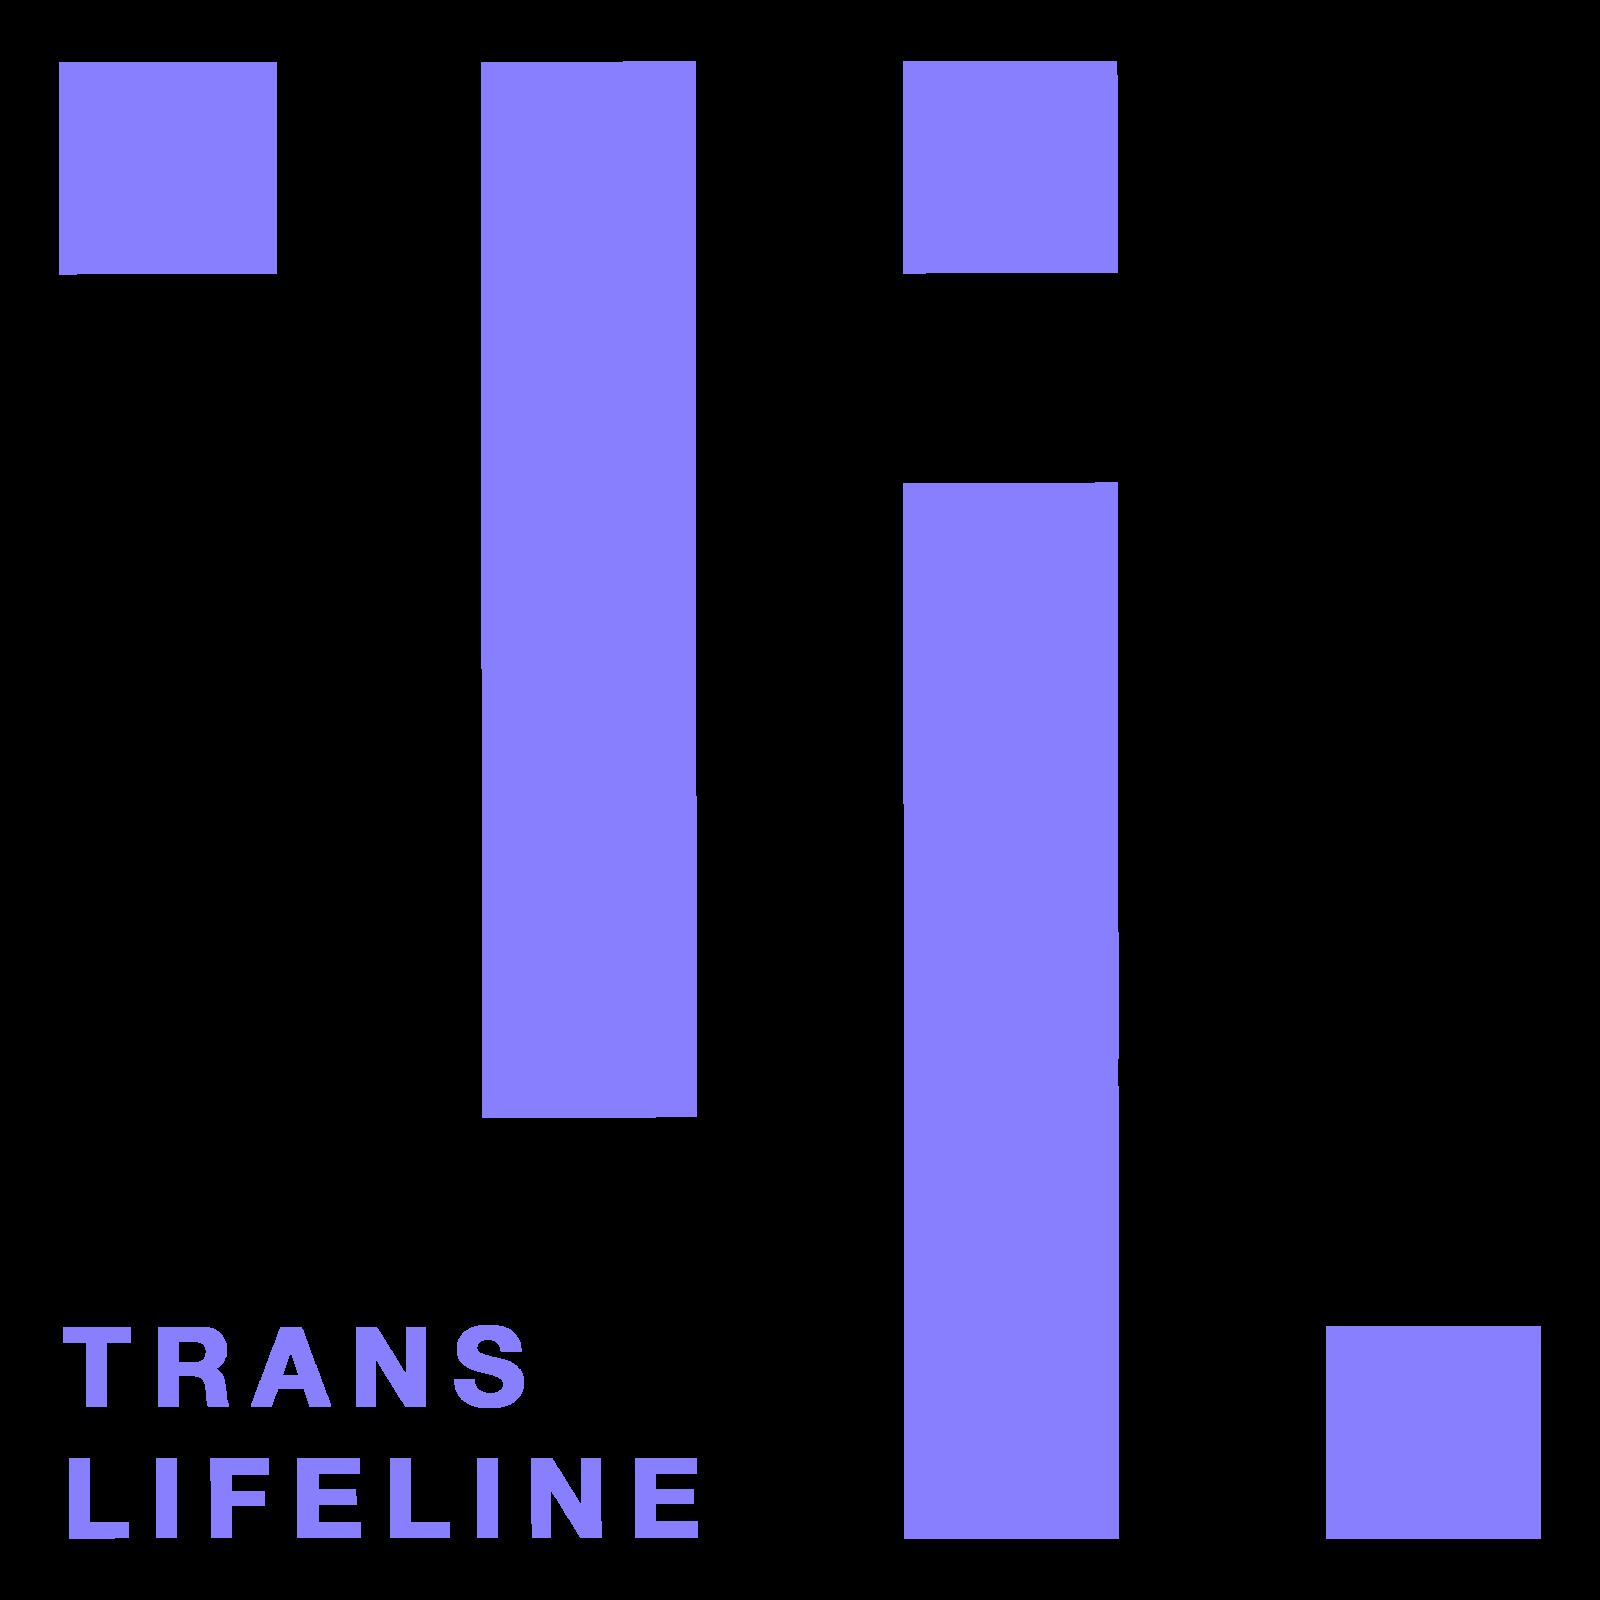 Trans Lifeline Official Logo